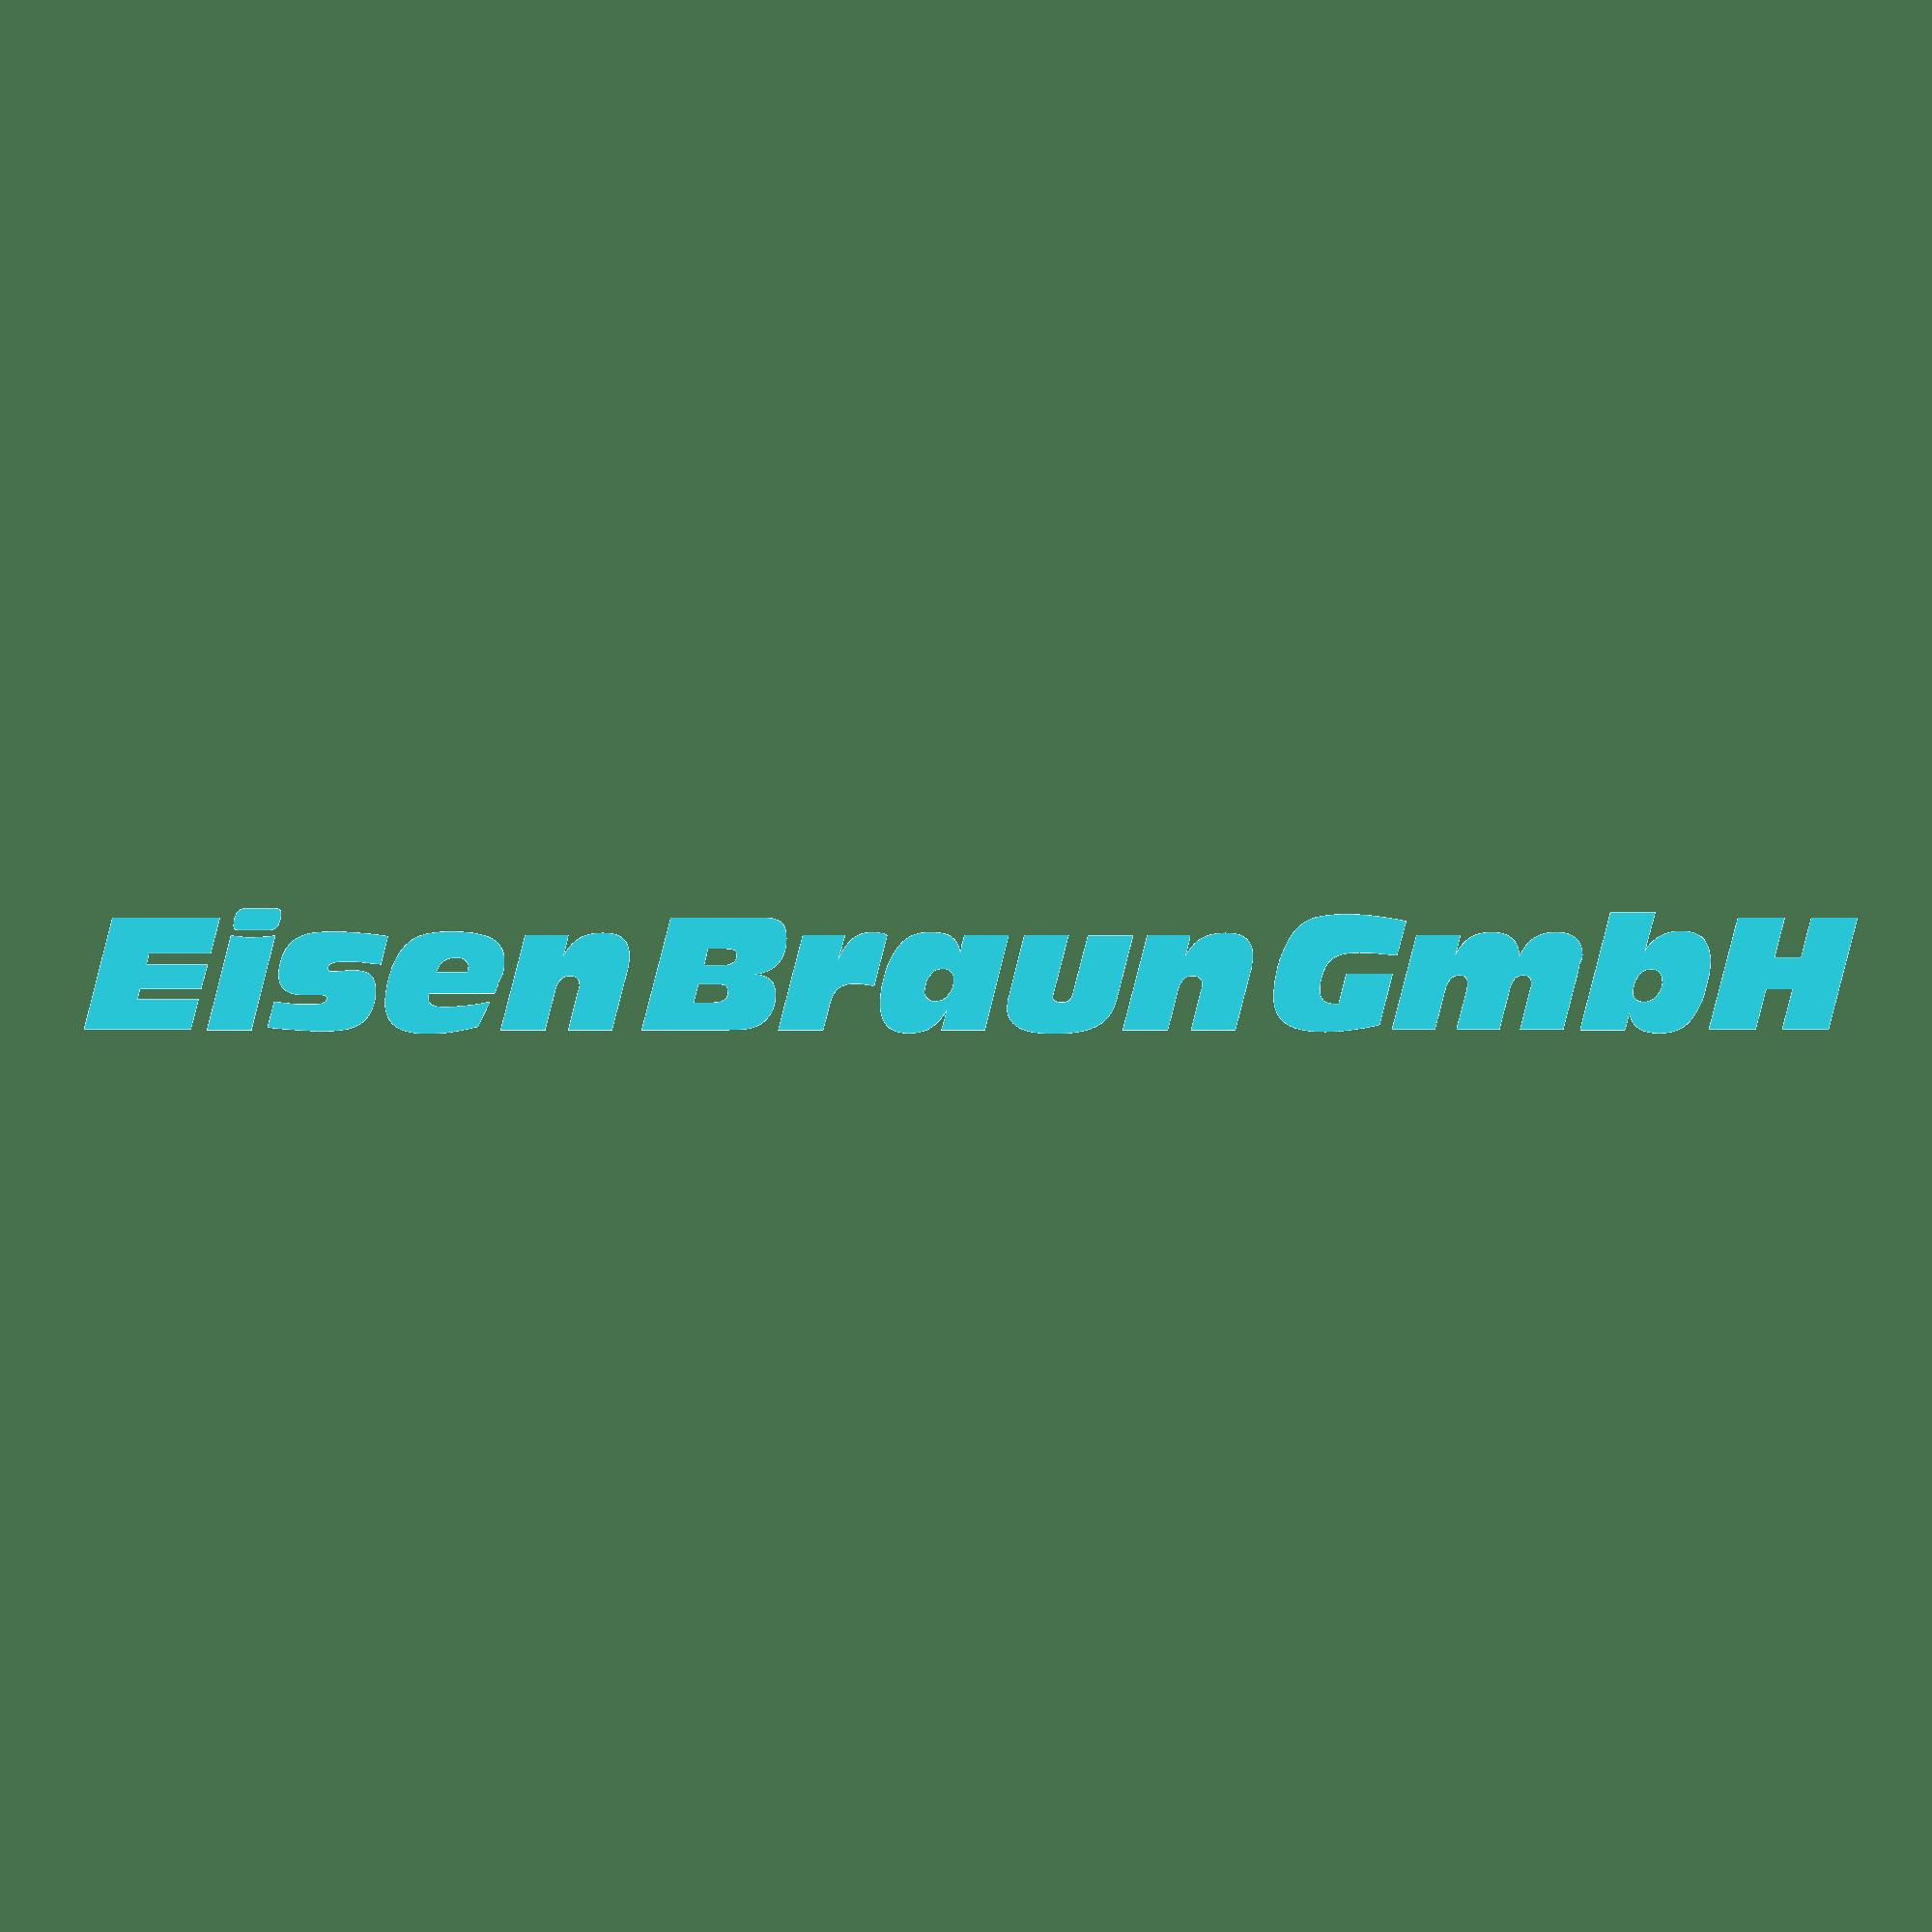 16zu9 eisenBraun GmbH Logo türkis